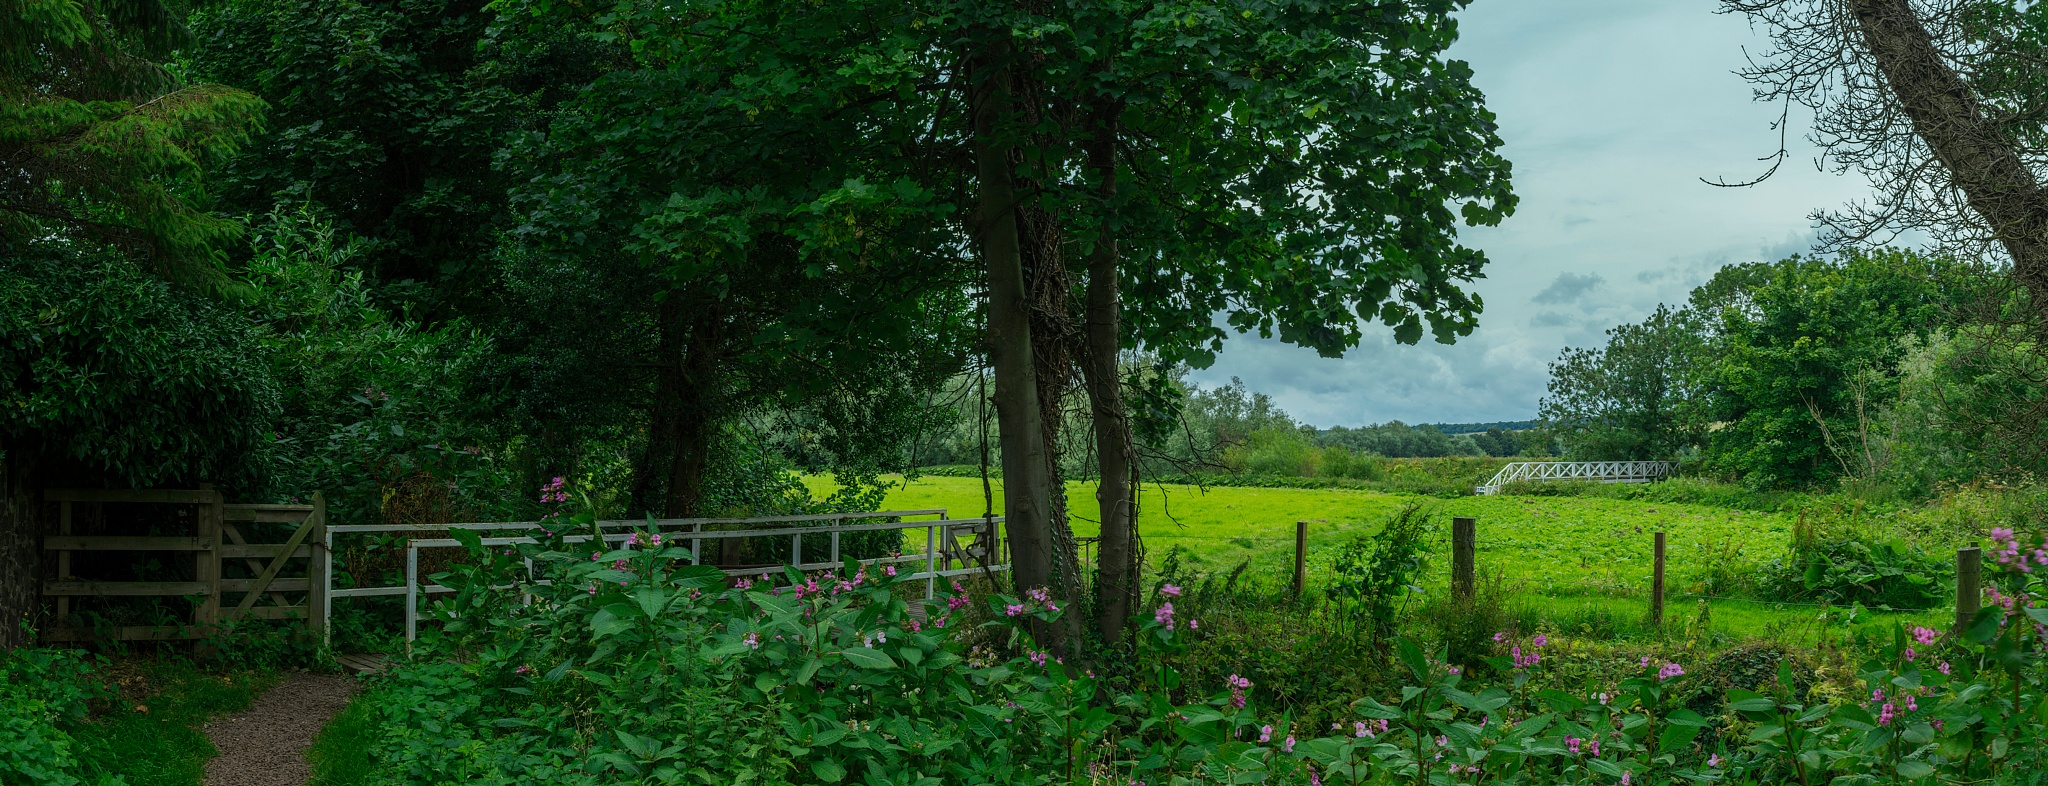 Path To Prestonmill by David Drummond